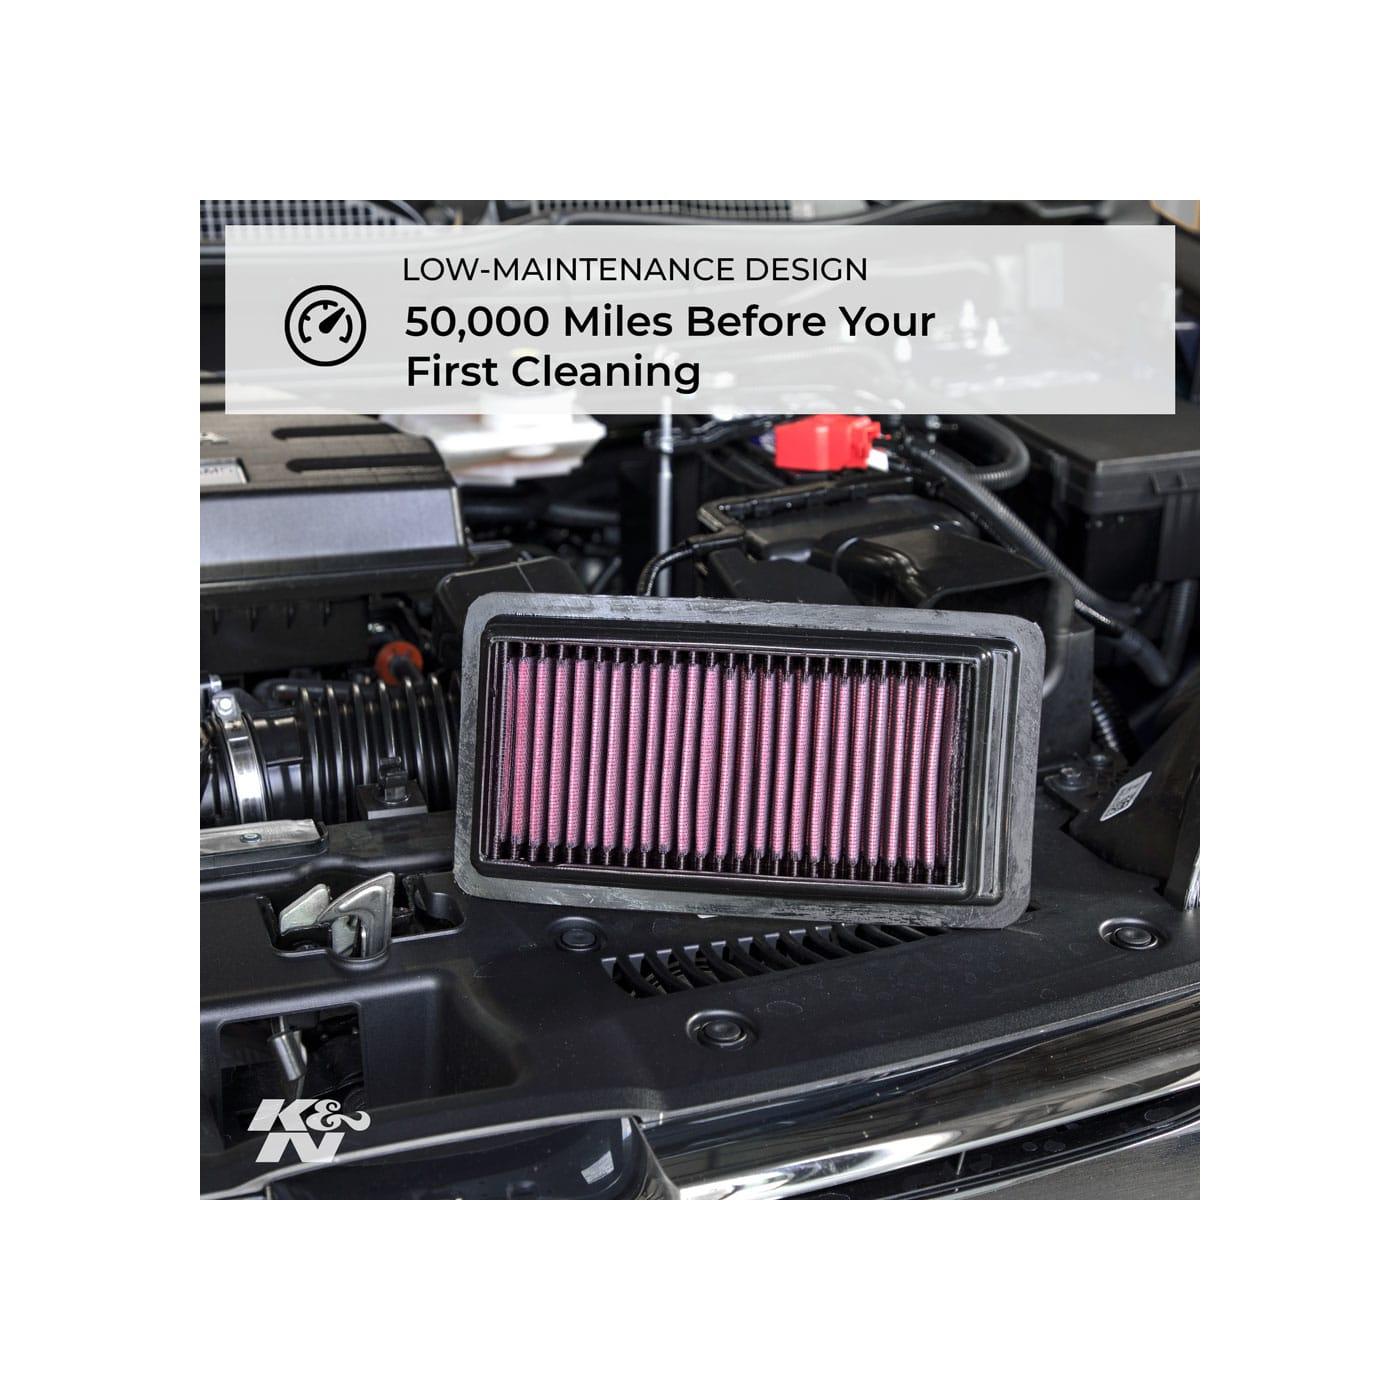 Filtro De Ar 33-2034 Mazda MX-5 Miata 323 Protege Familia Kia Sephia Ford Escort Eunos 100 Hyundai Excel